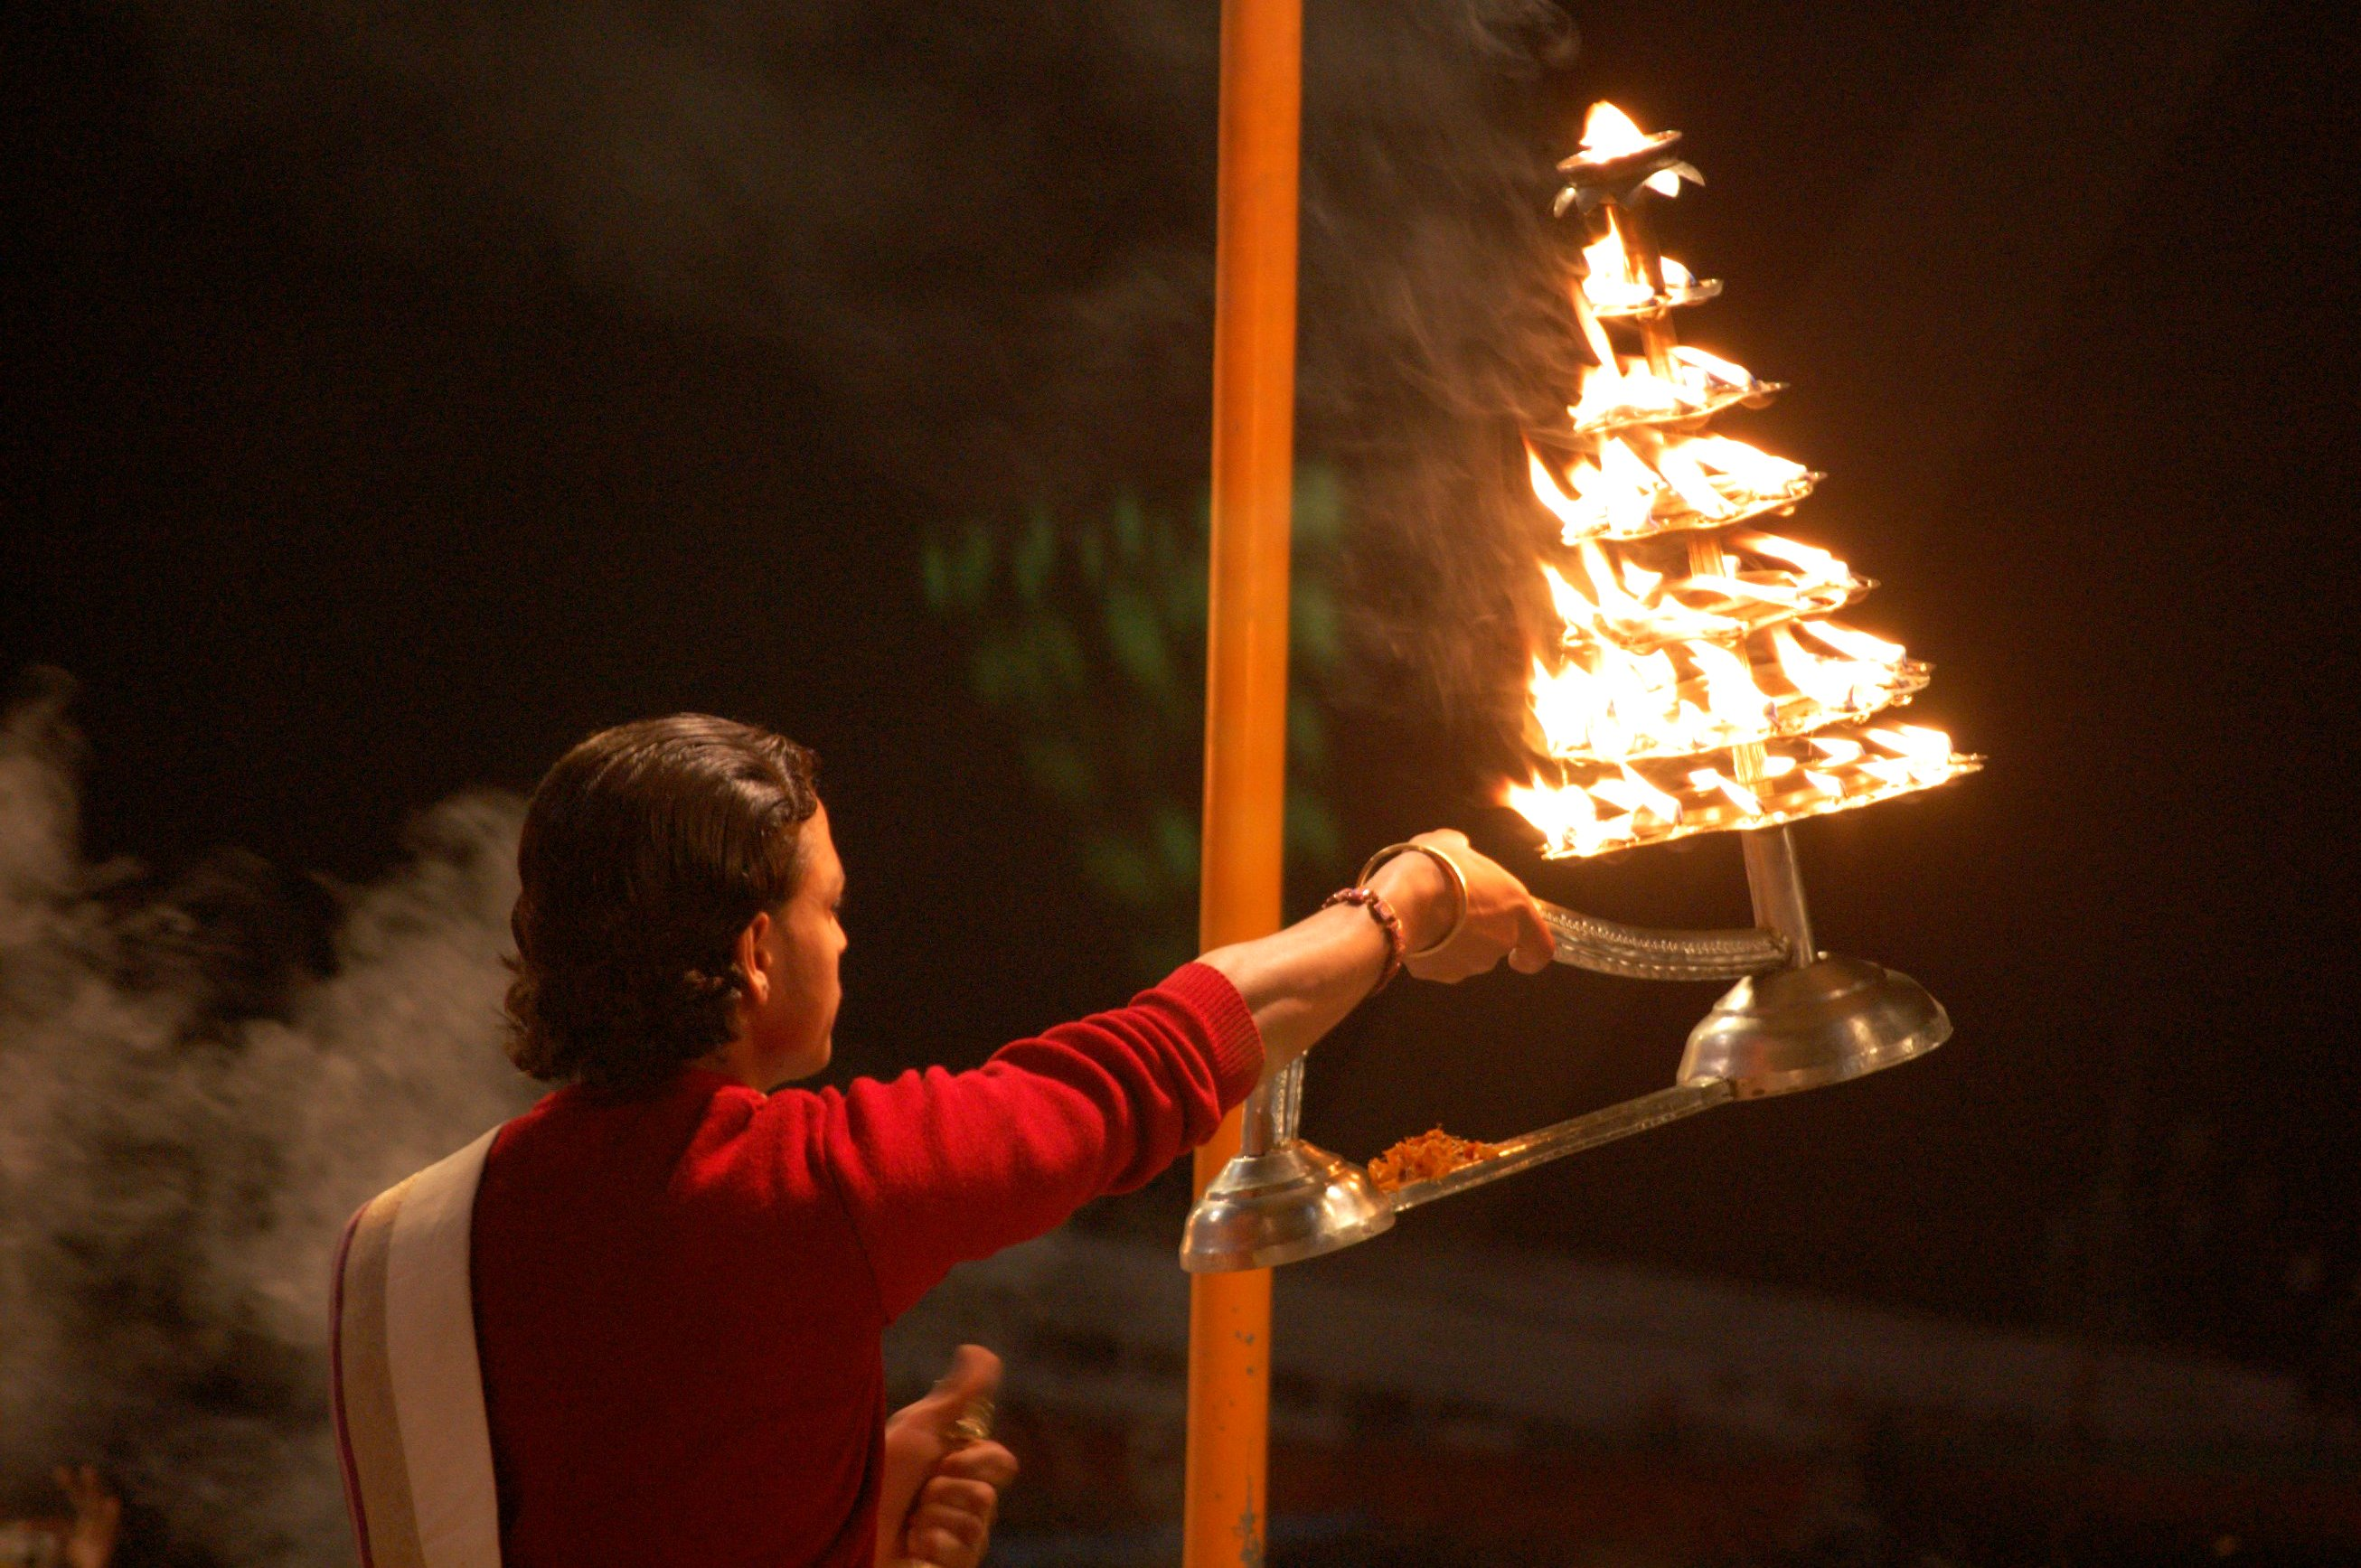 File:Puja, the Hindu prayer ceremony India.jpg - Wikimedia ...